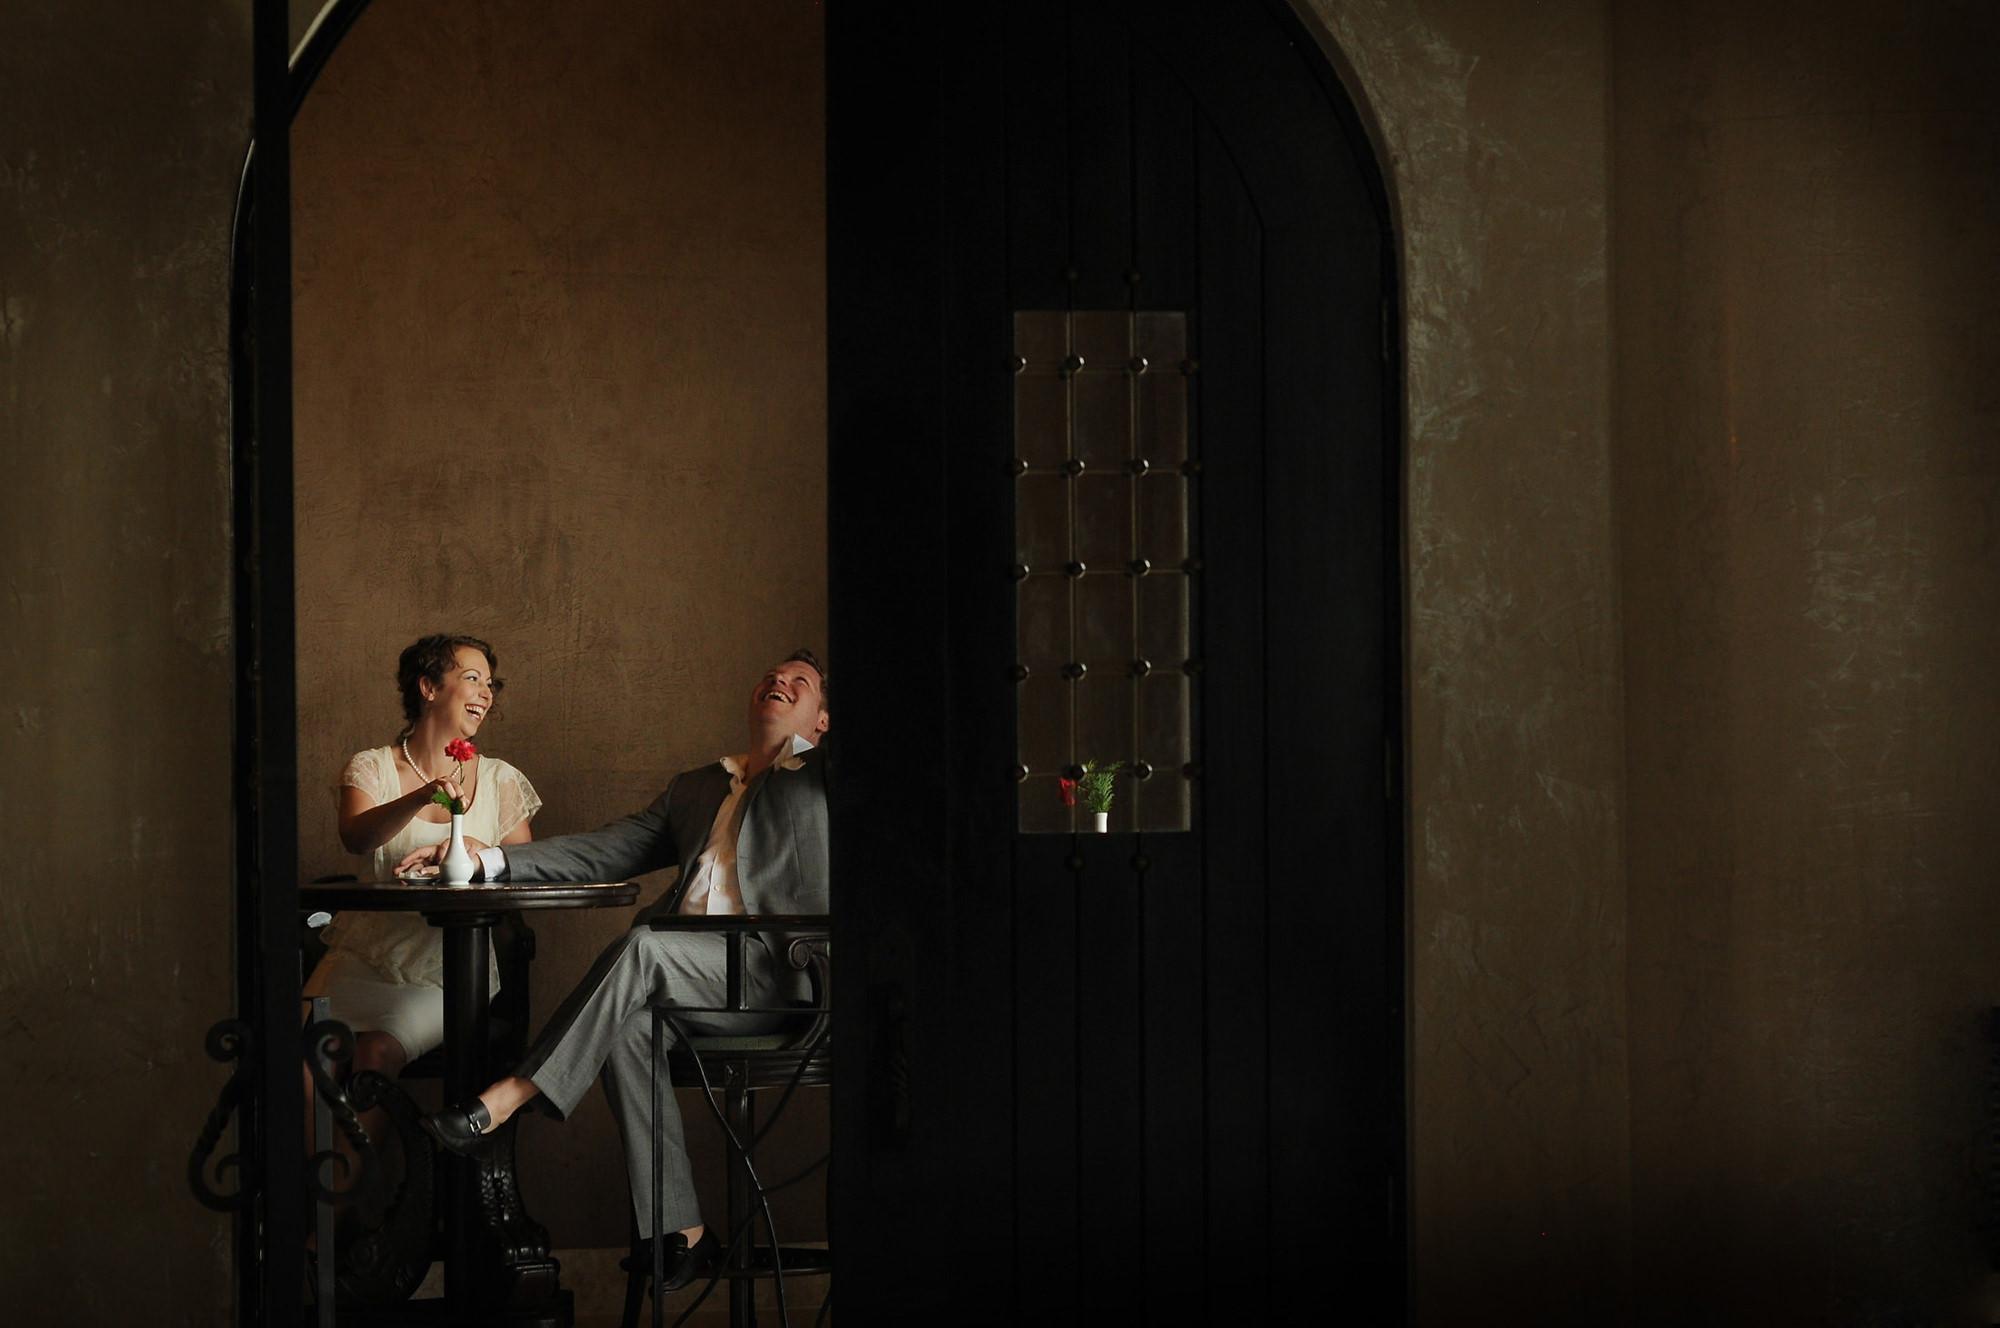 bride-and-groom-laughing-in-doorway-worlds-best-wedding-photos-daniel-aguilar-houston-wedding-photographers